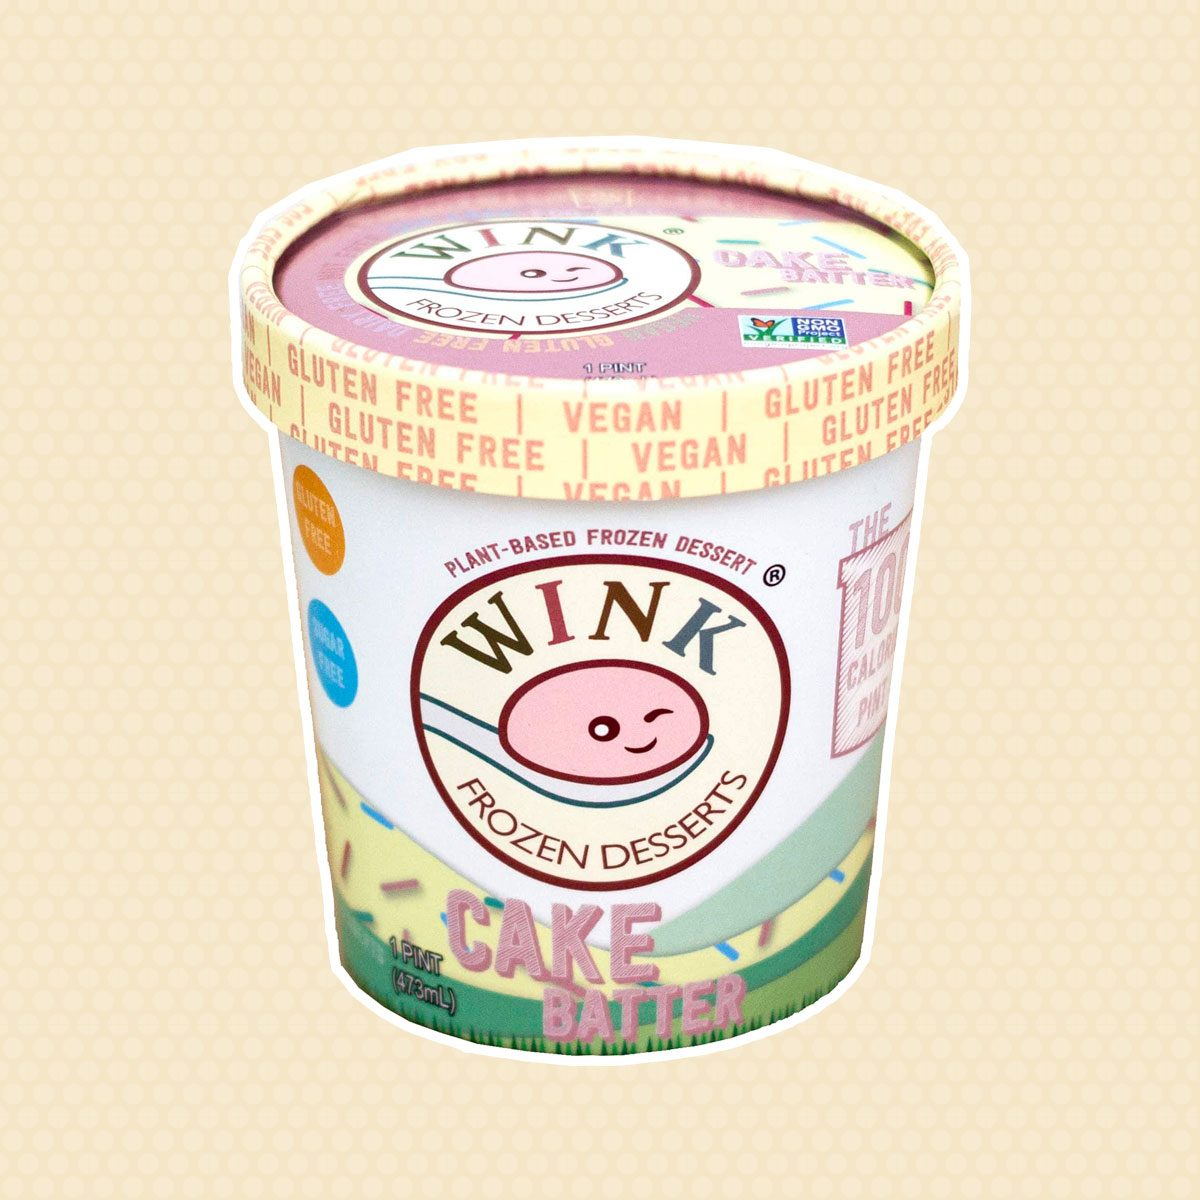 Wink cake batter ice cream tub